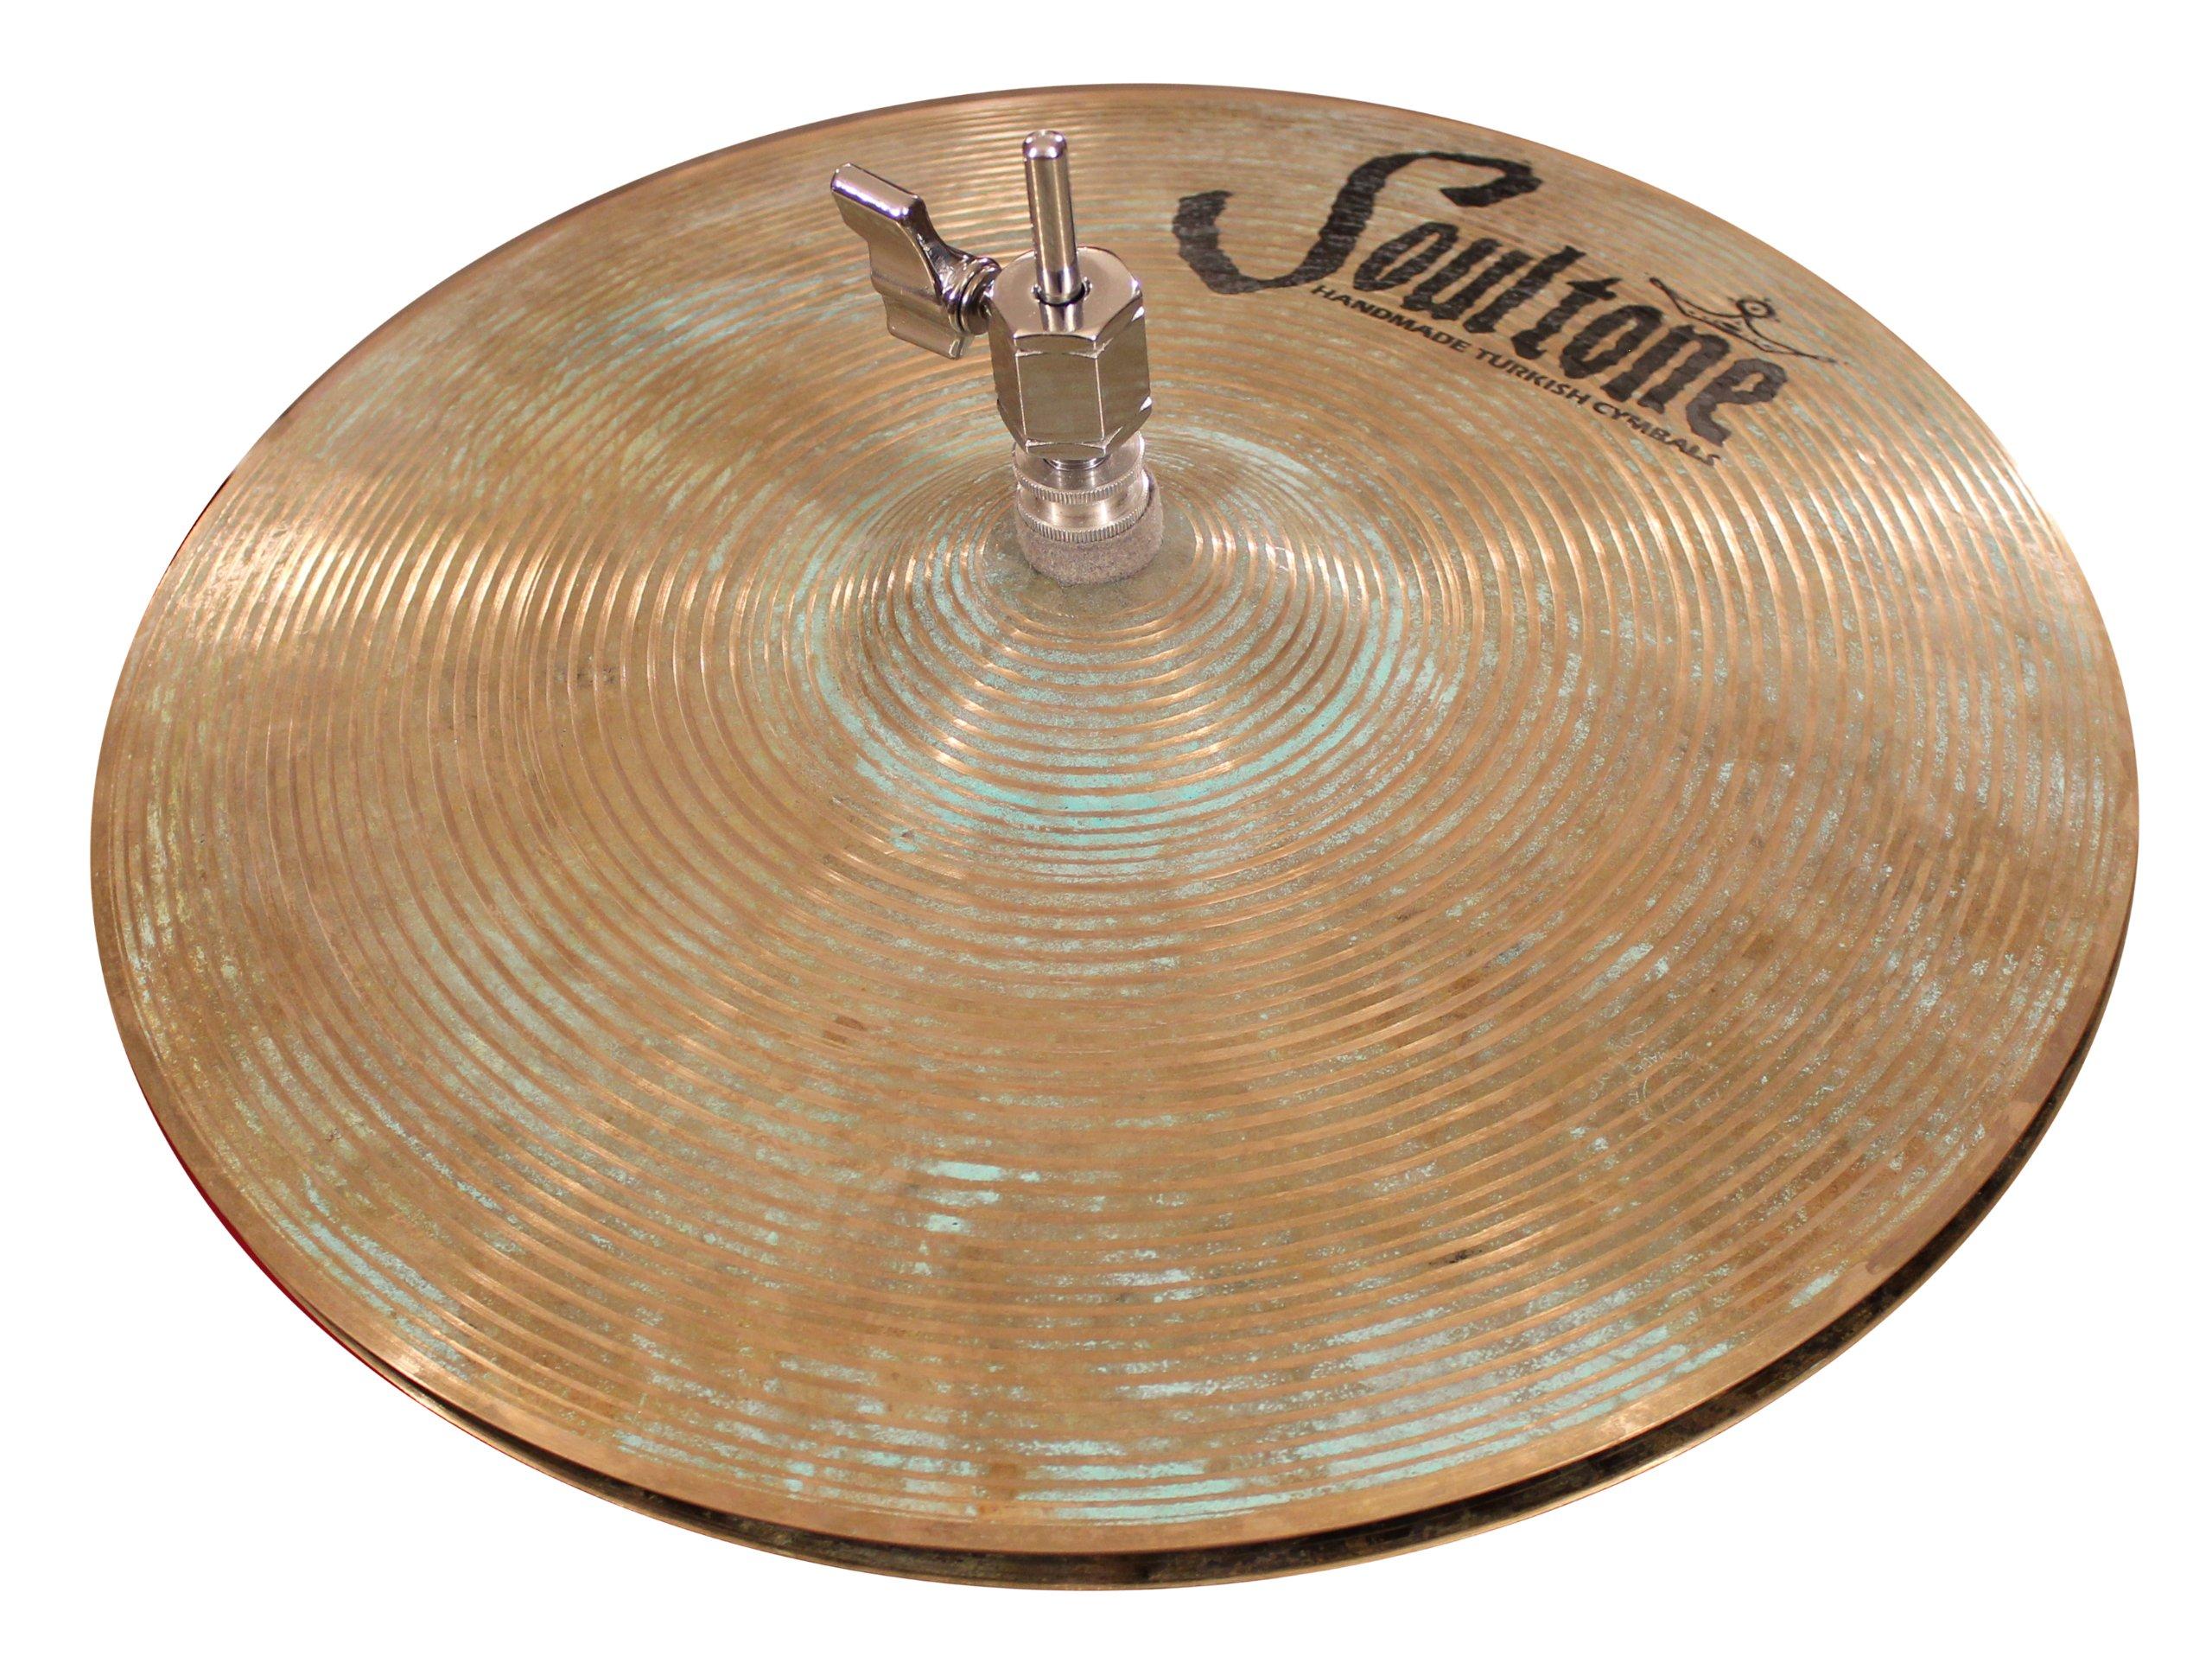 Soultone Cymbals VOSP-HHT12-12'' Vintage Old School Patina Hi Hats Pair